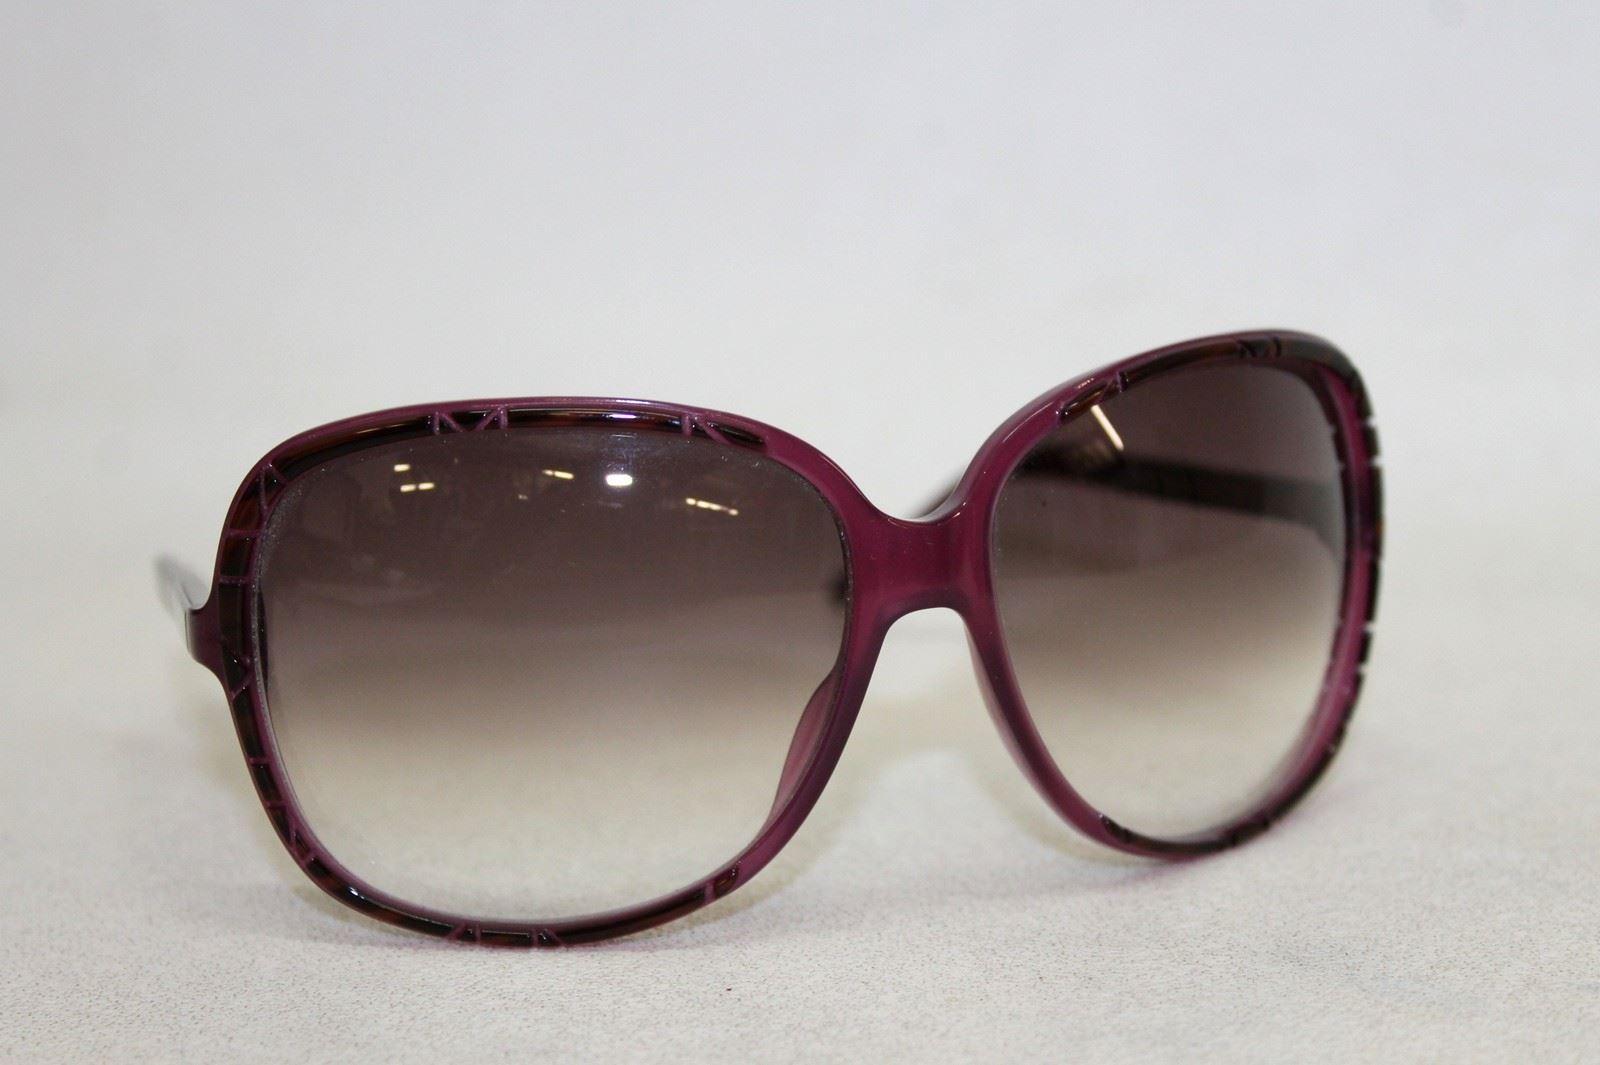 43e994a573d Christian Dior Ladies Sunglasses